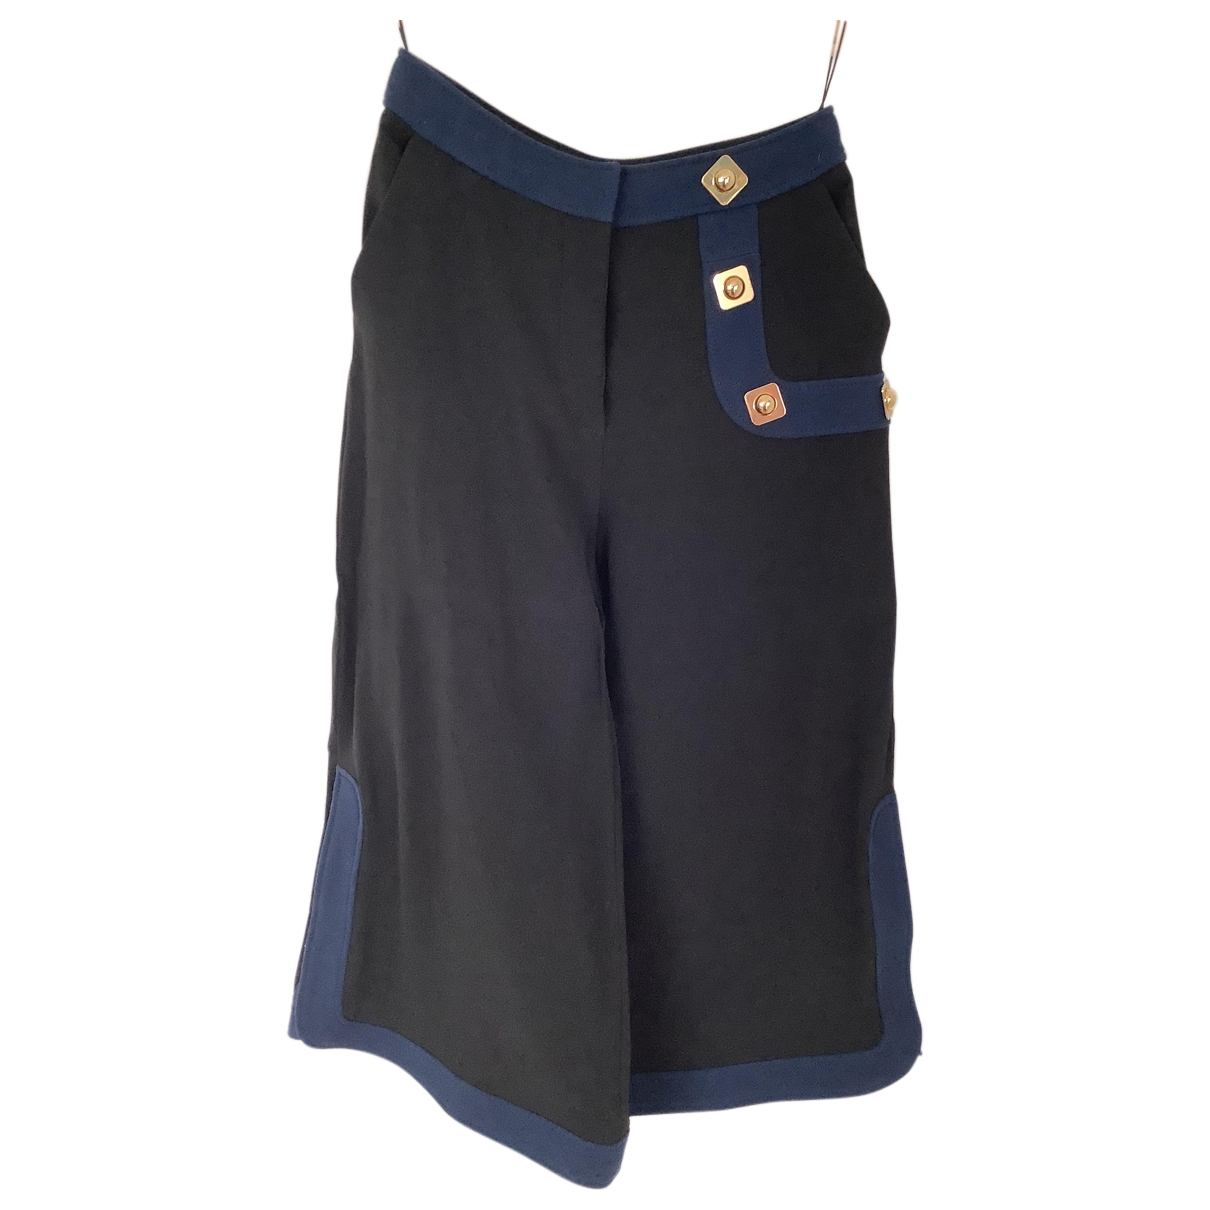 Peter Pilotto \N Shorts in  Schwarz Wolle